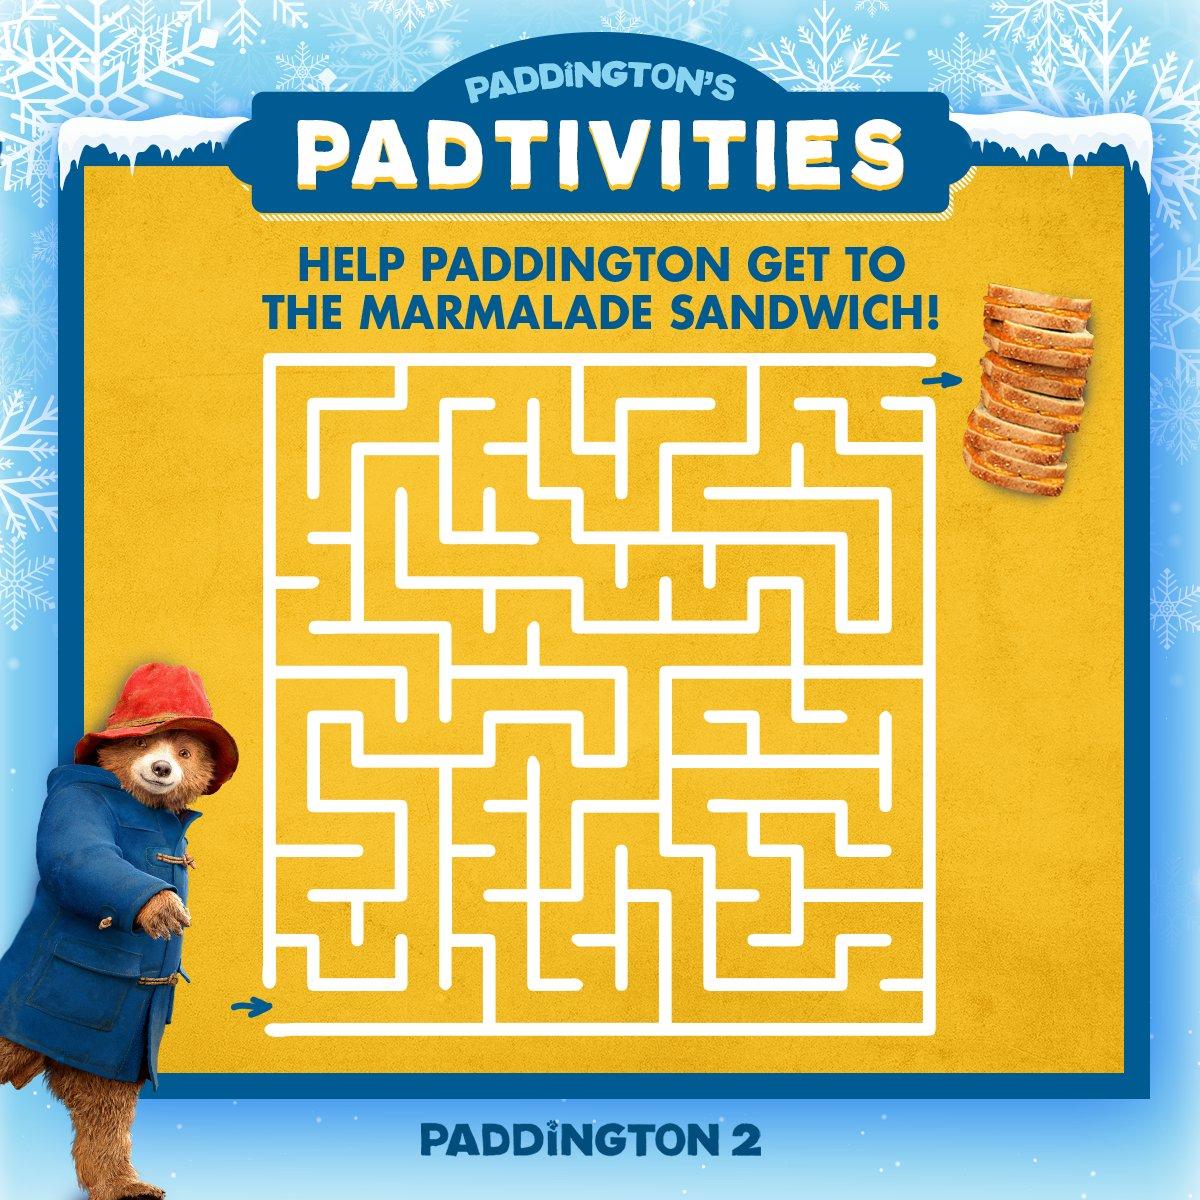 Paddington Paddingtonbear